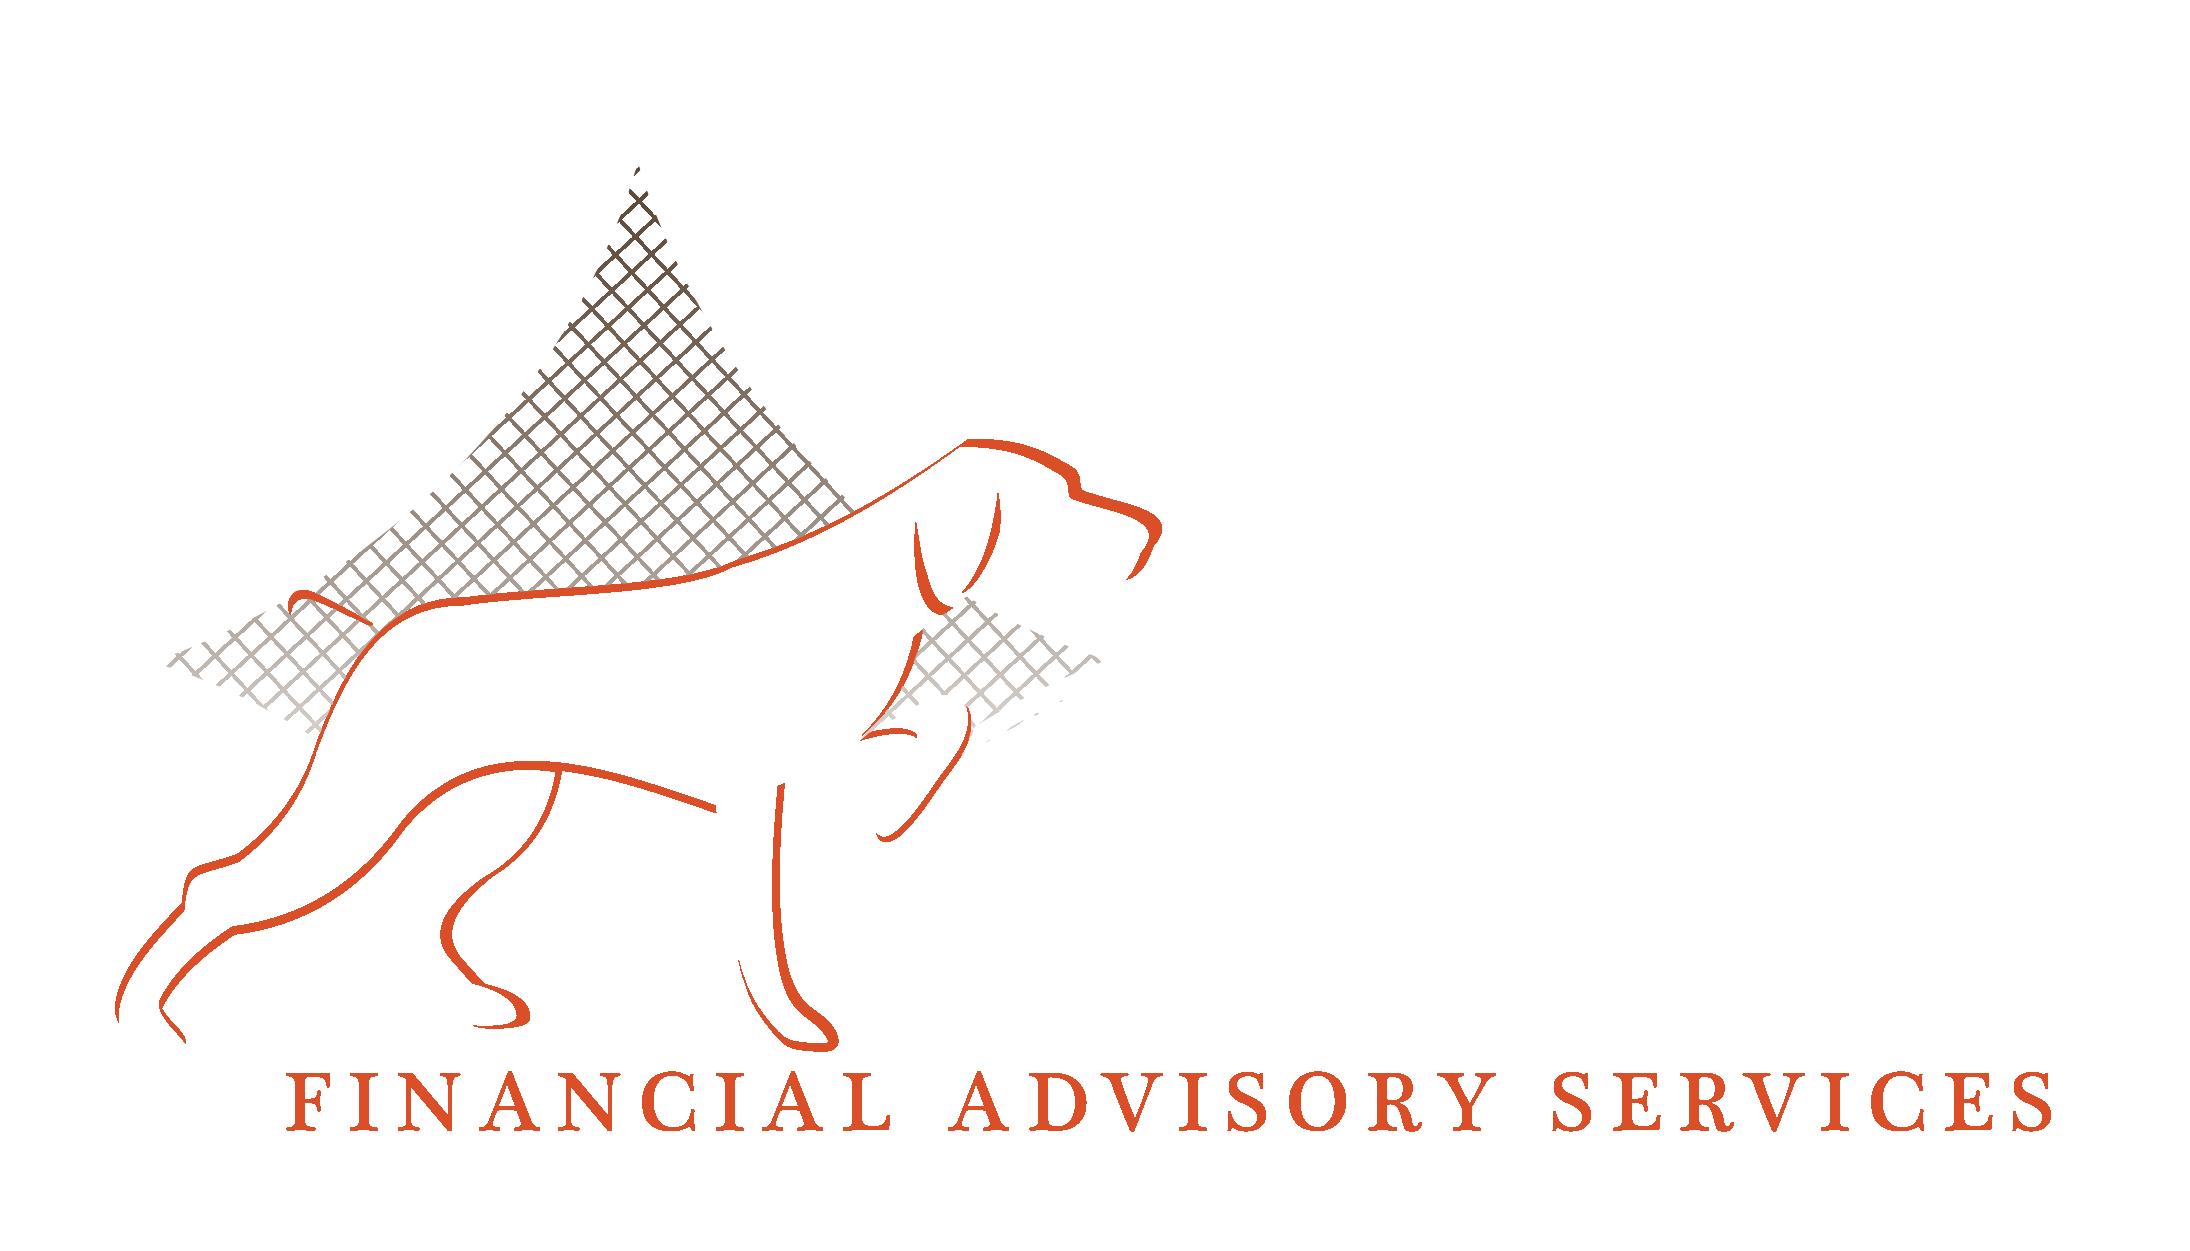 Wilson Financial Advisory Services